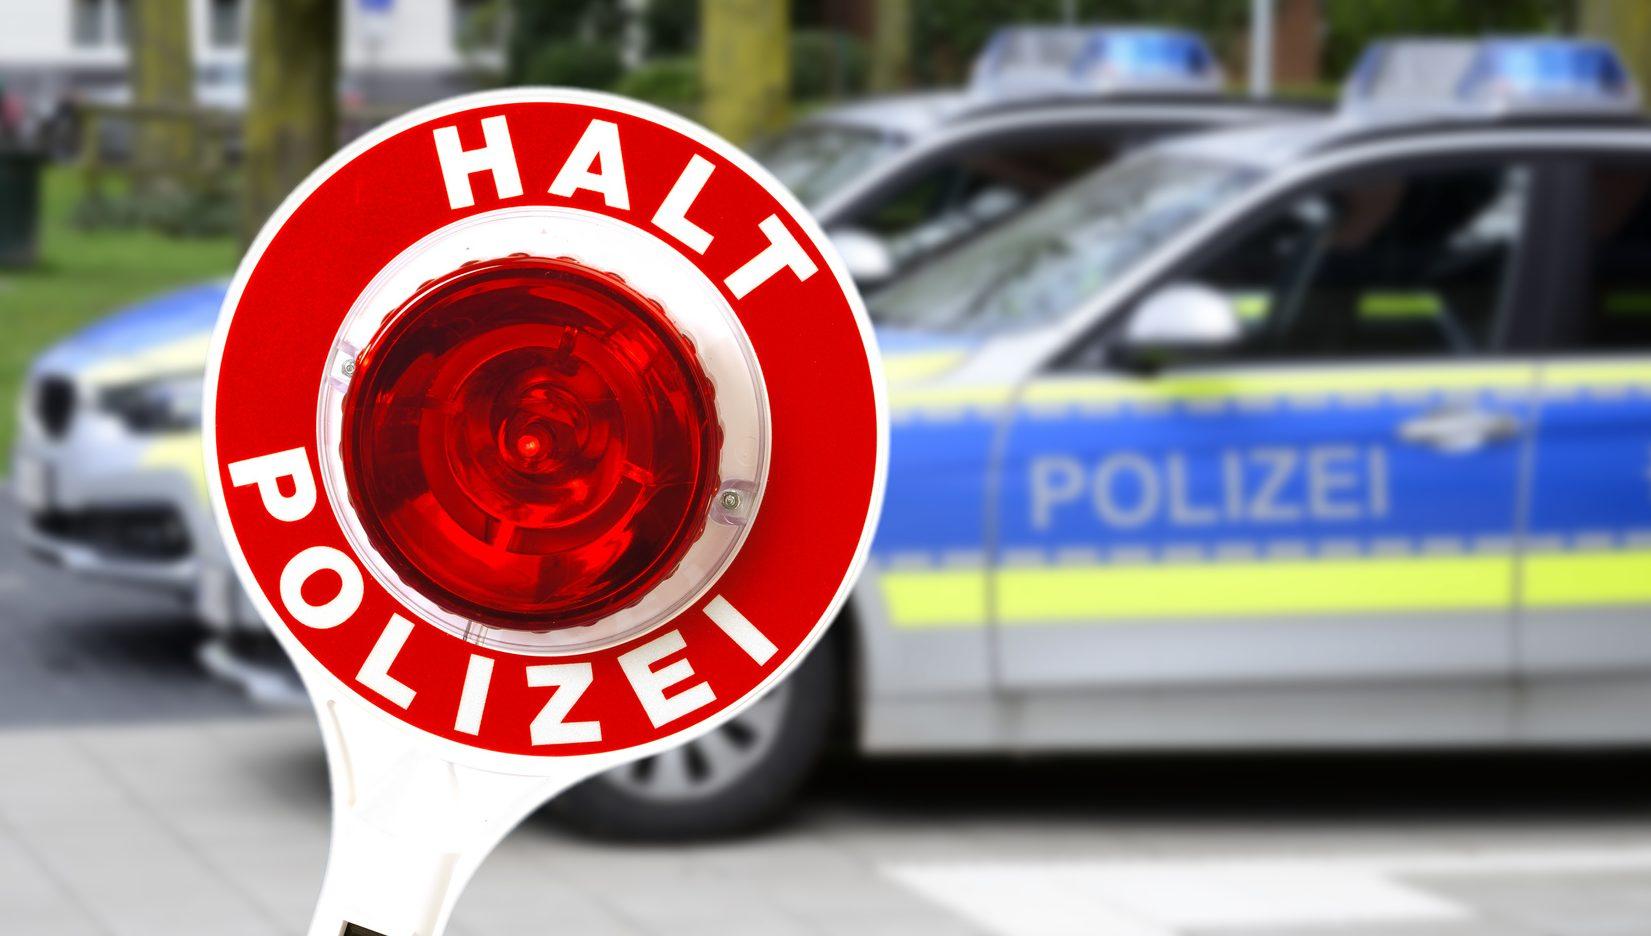 Polizei Verkehrsbericht Lübeck